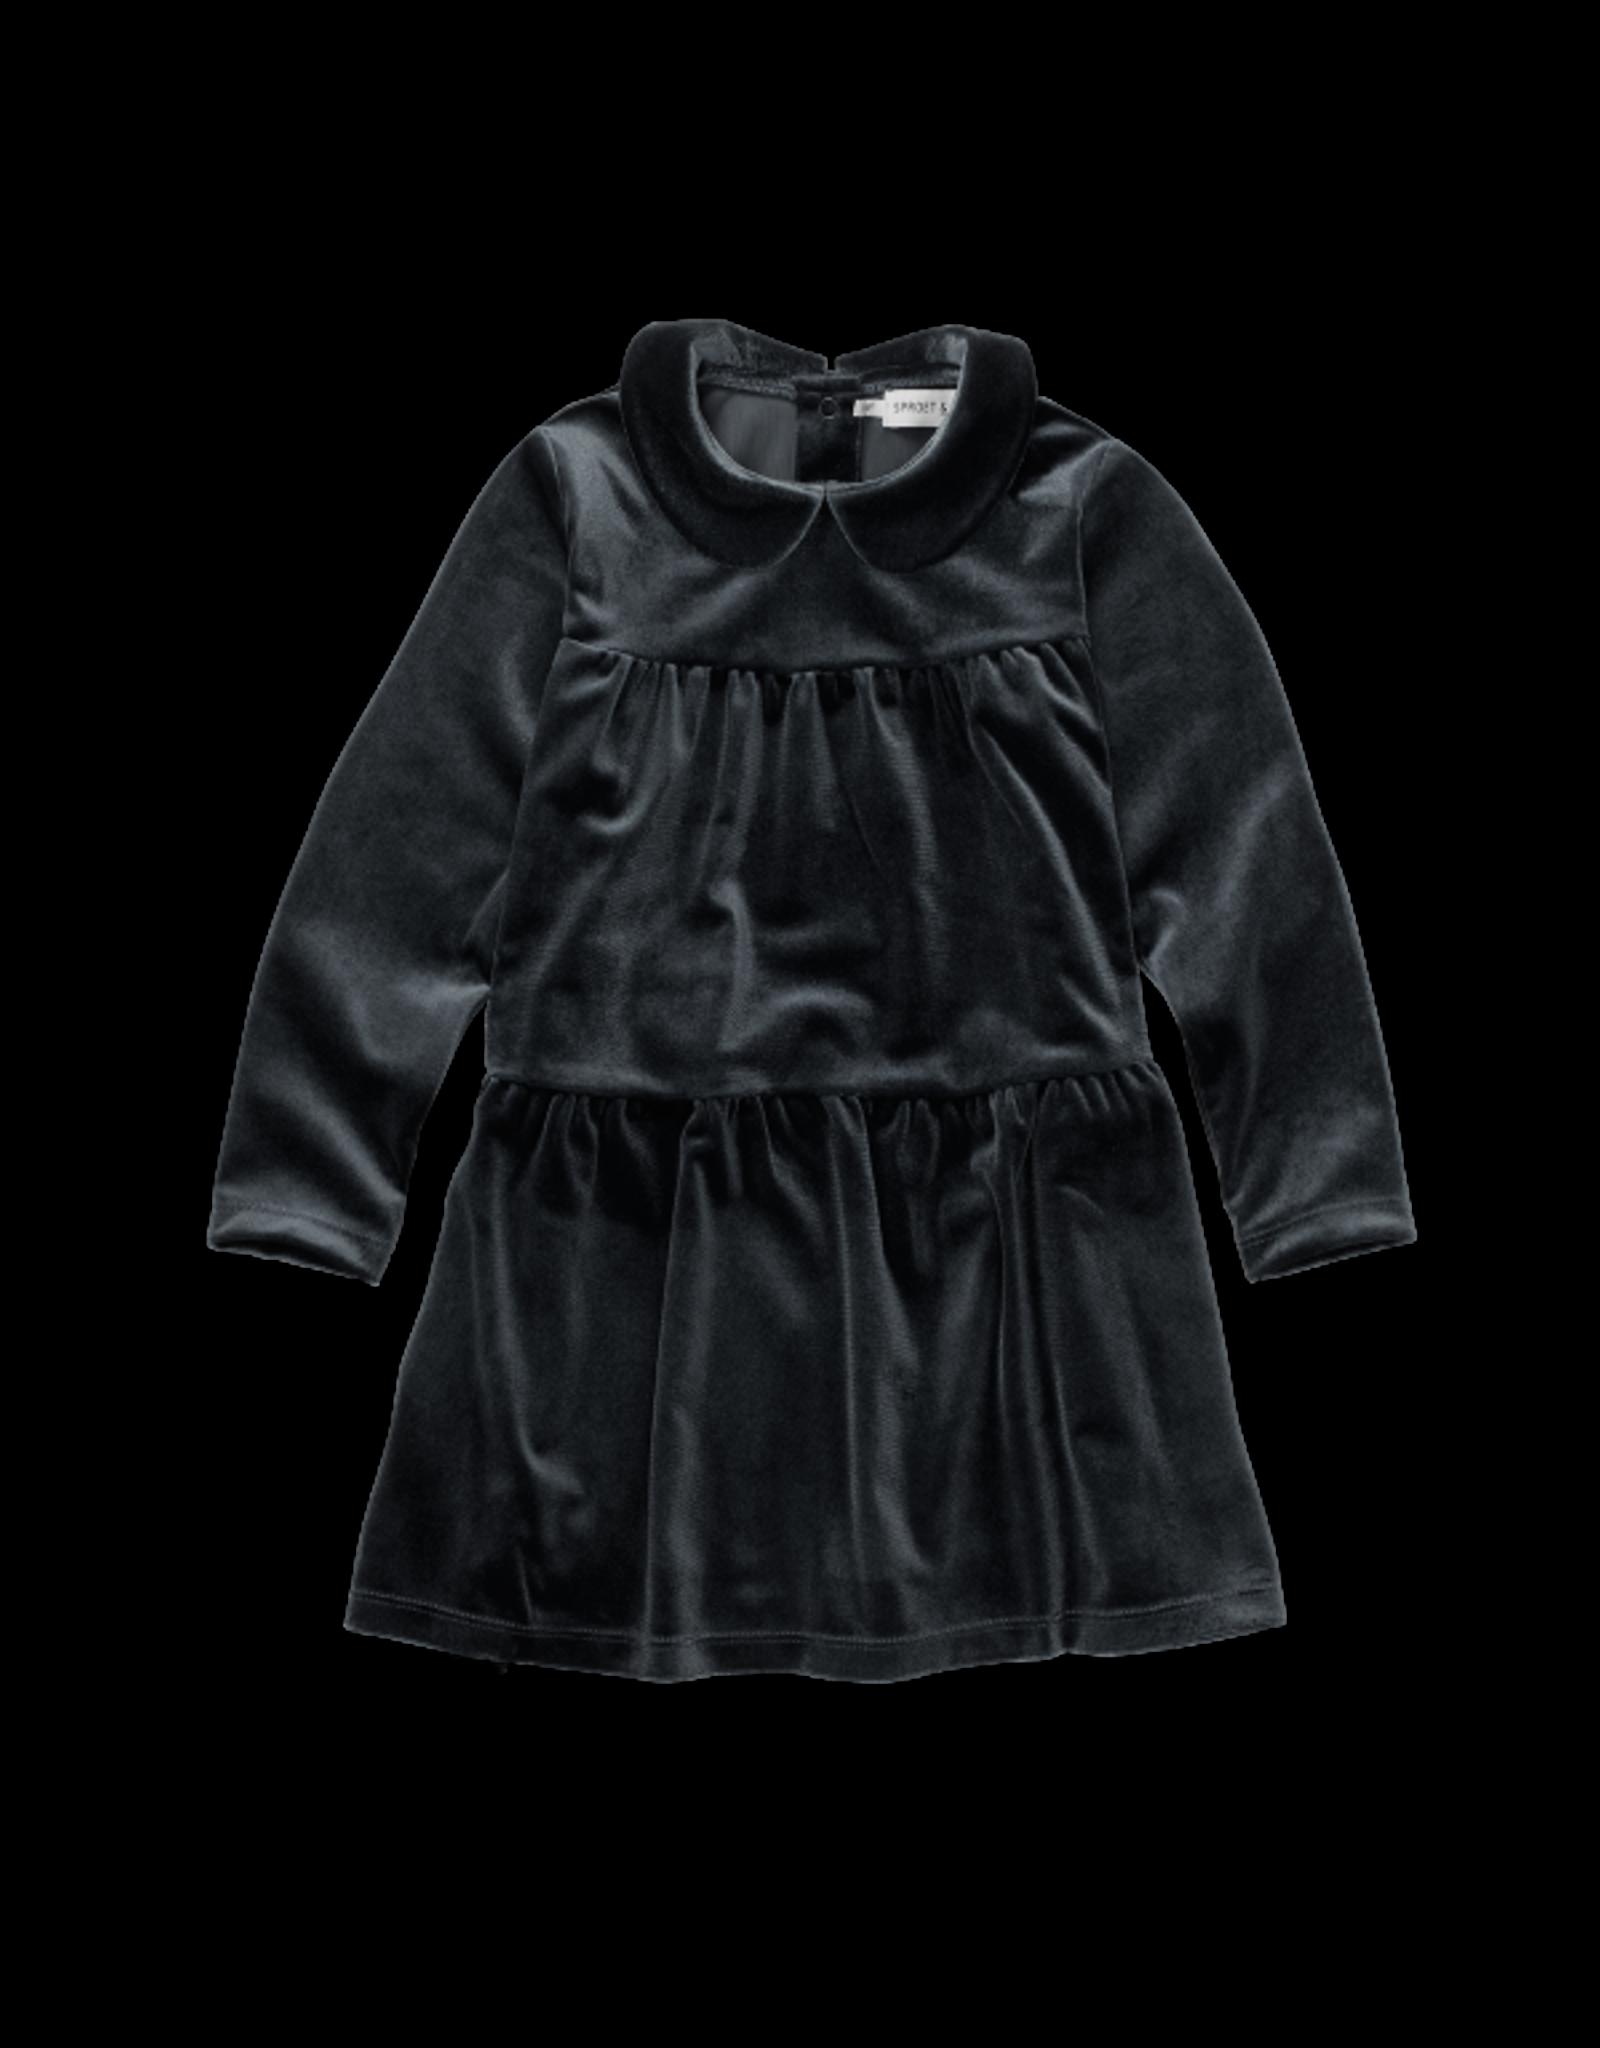 Sproet & Sprout Sproet & Sprout Dress Velvet Black